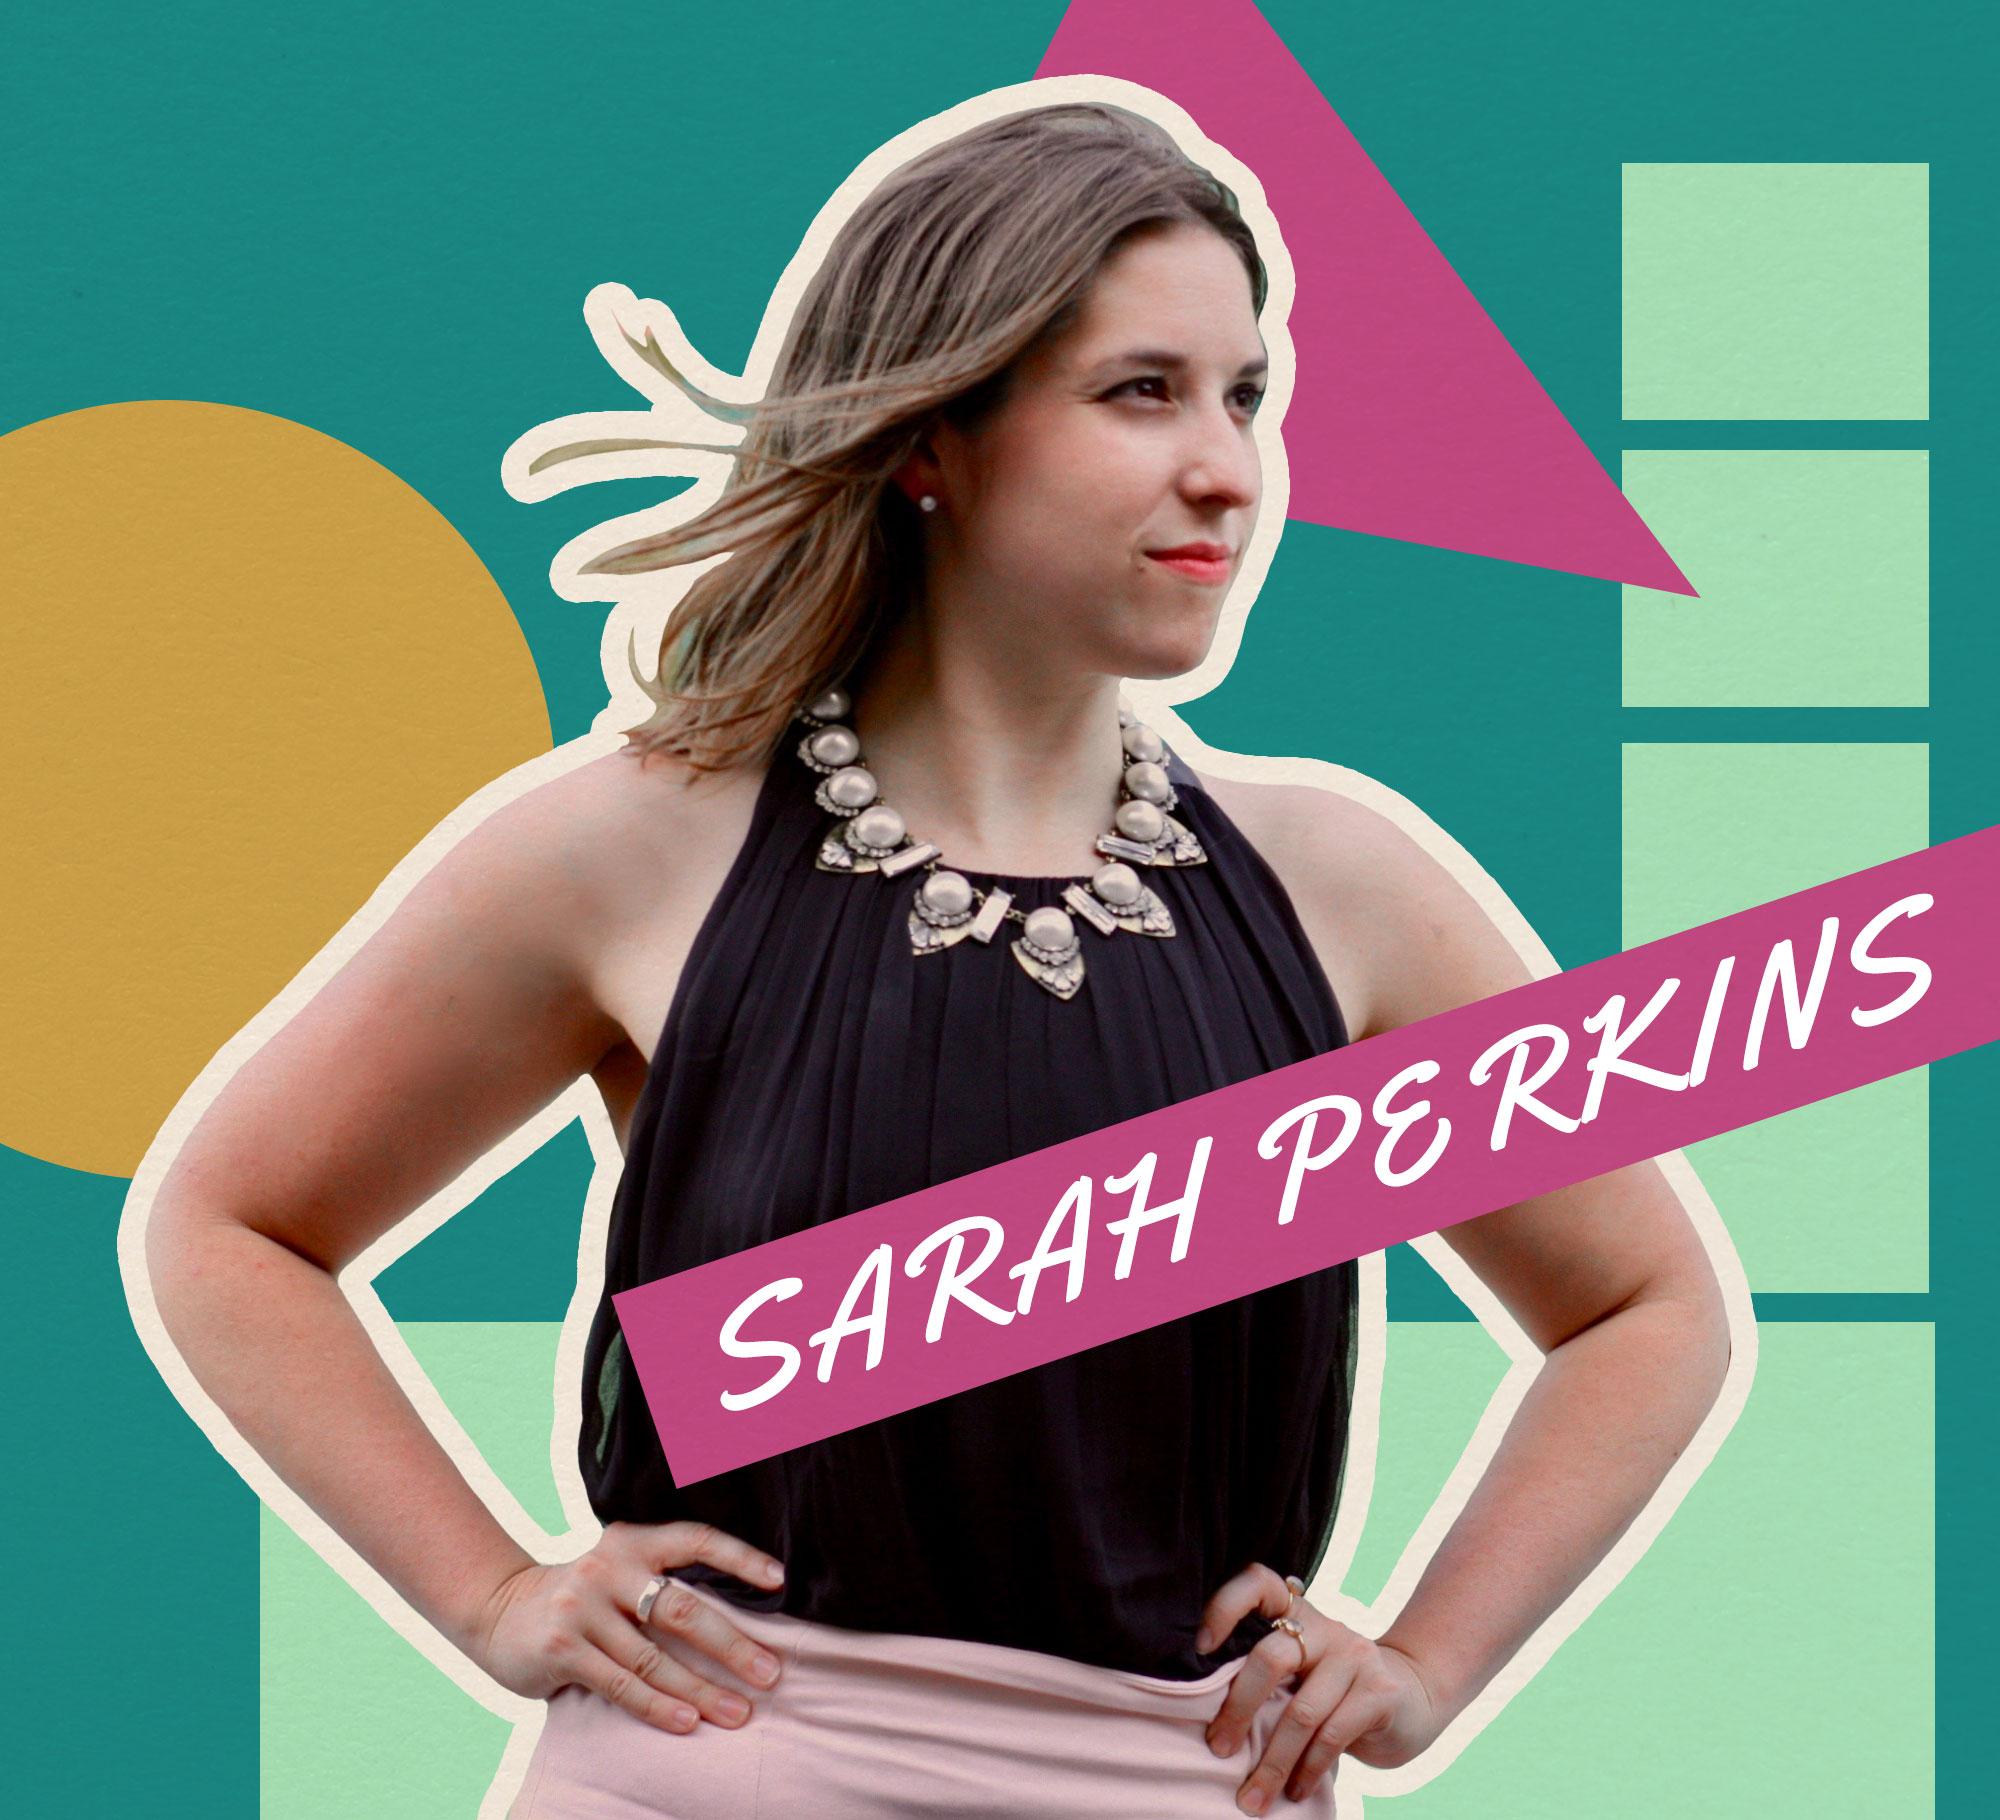 Original-Spinster-Sarah.jpg